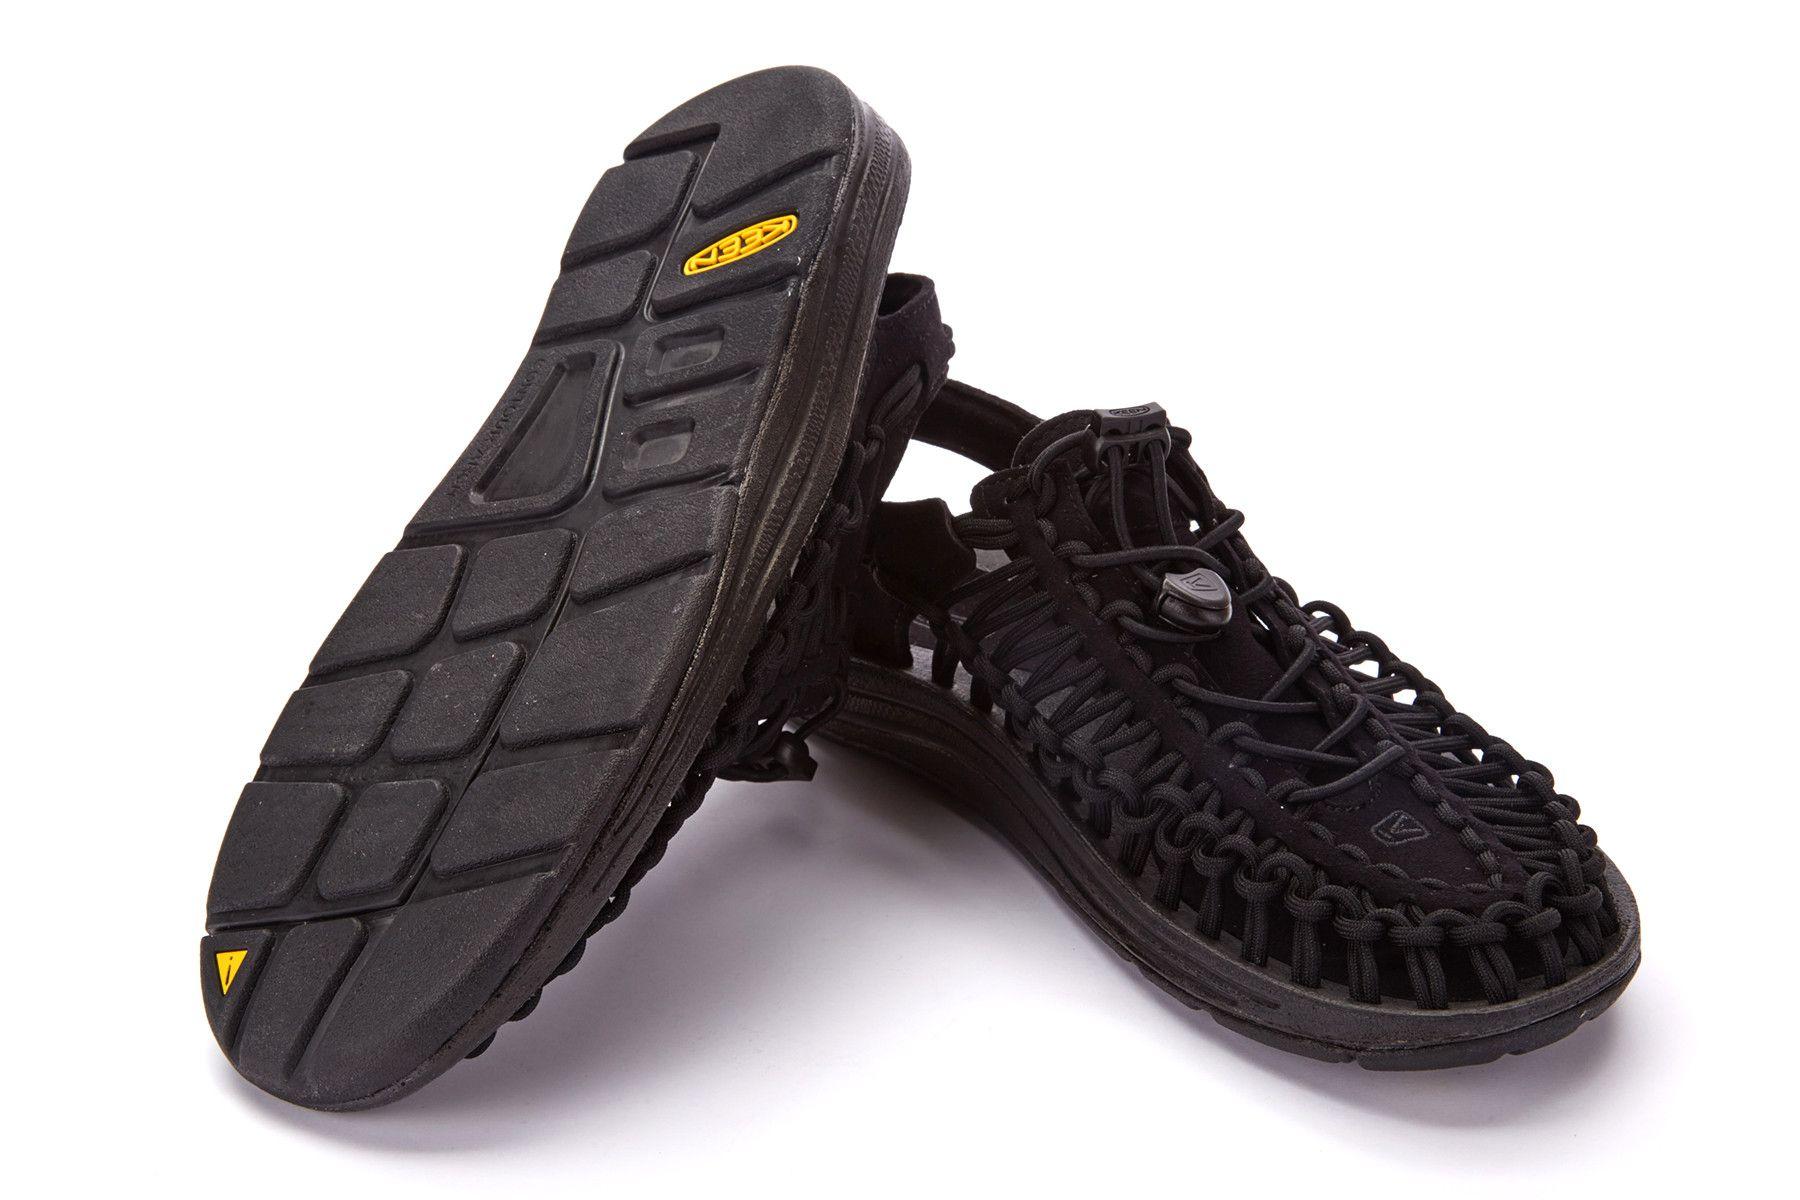 Black sandals grunge -  Women S Sport Sandals Keen Uneek Black